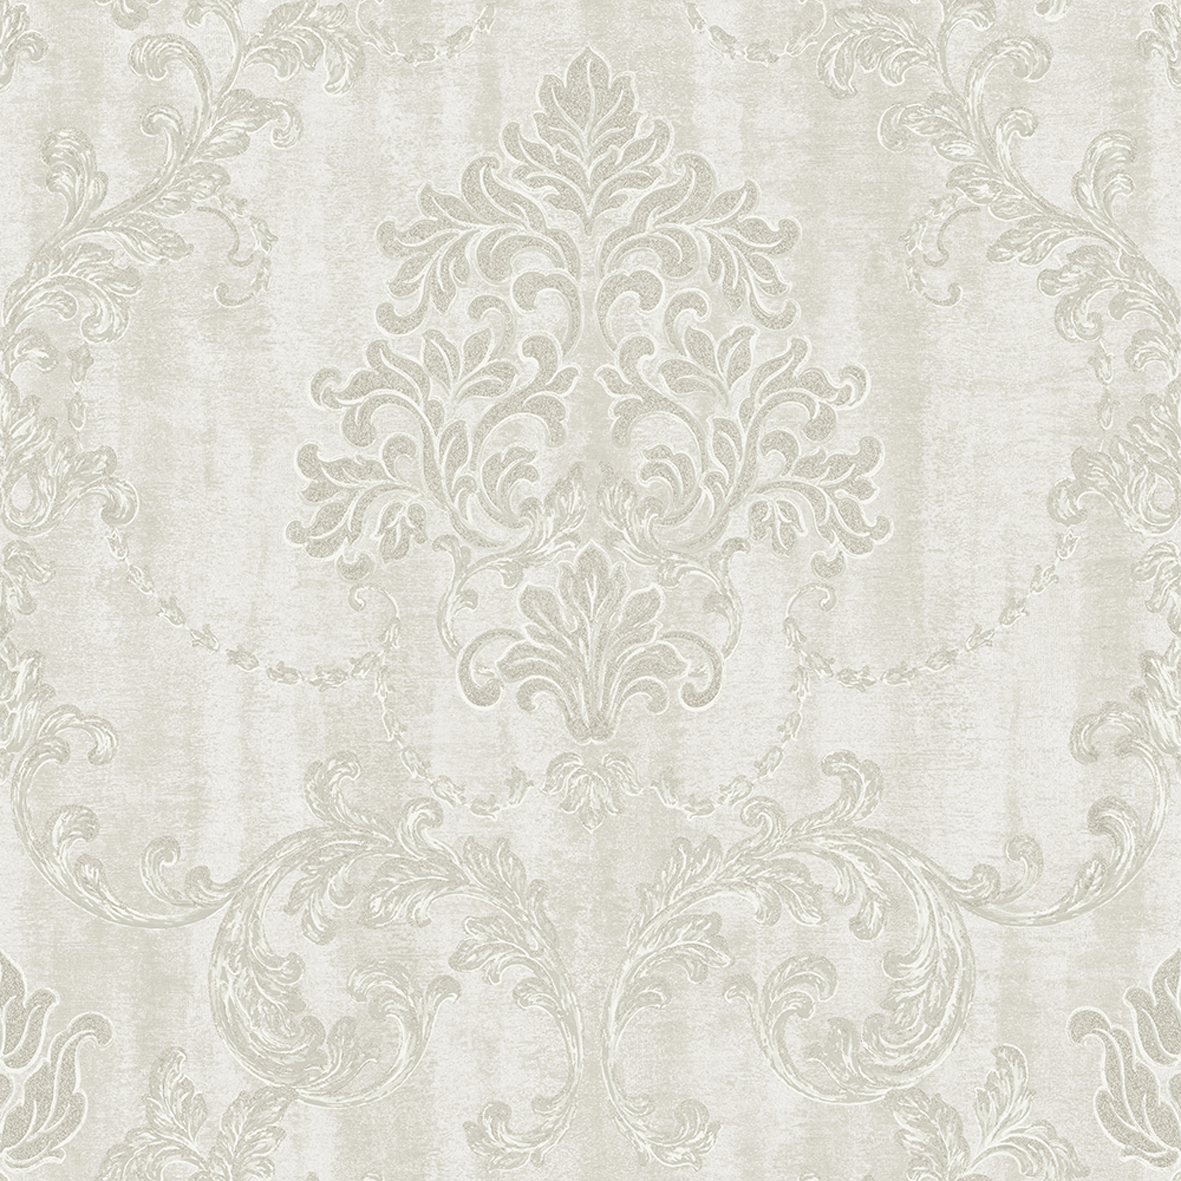 130301 Lauretta Ivory